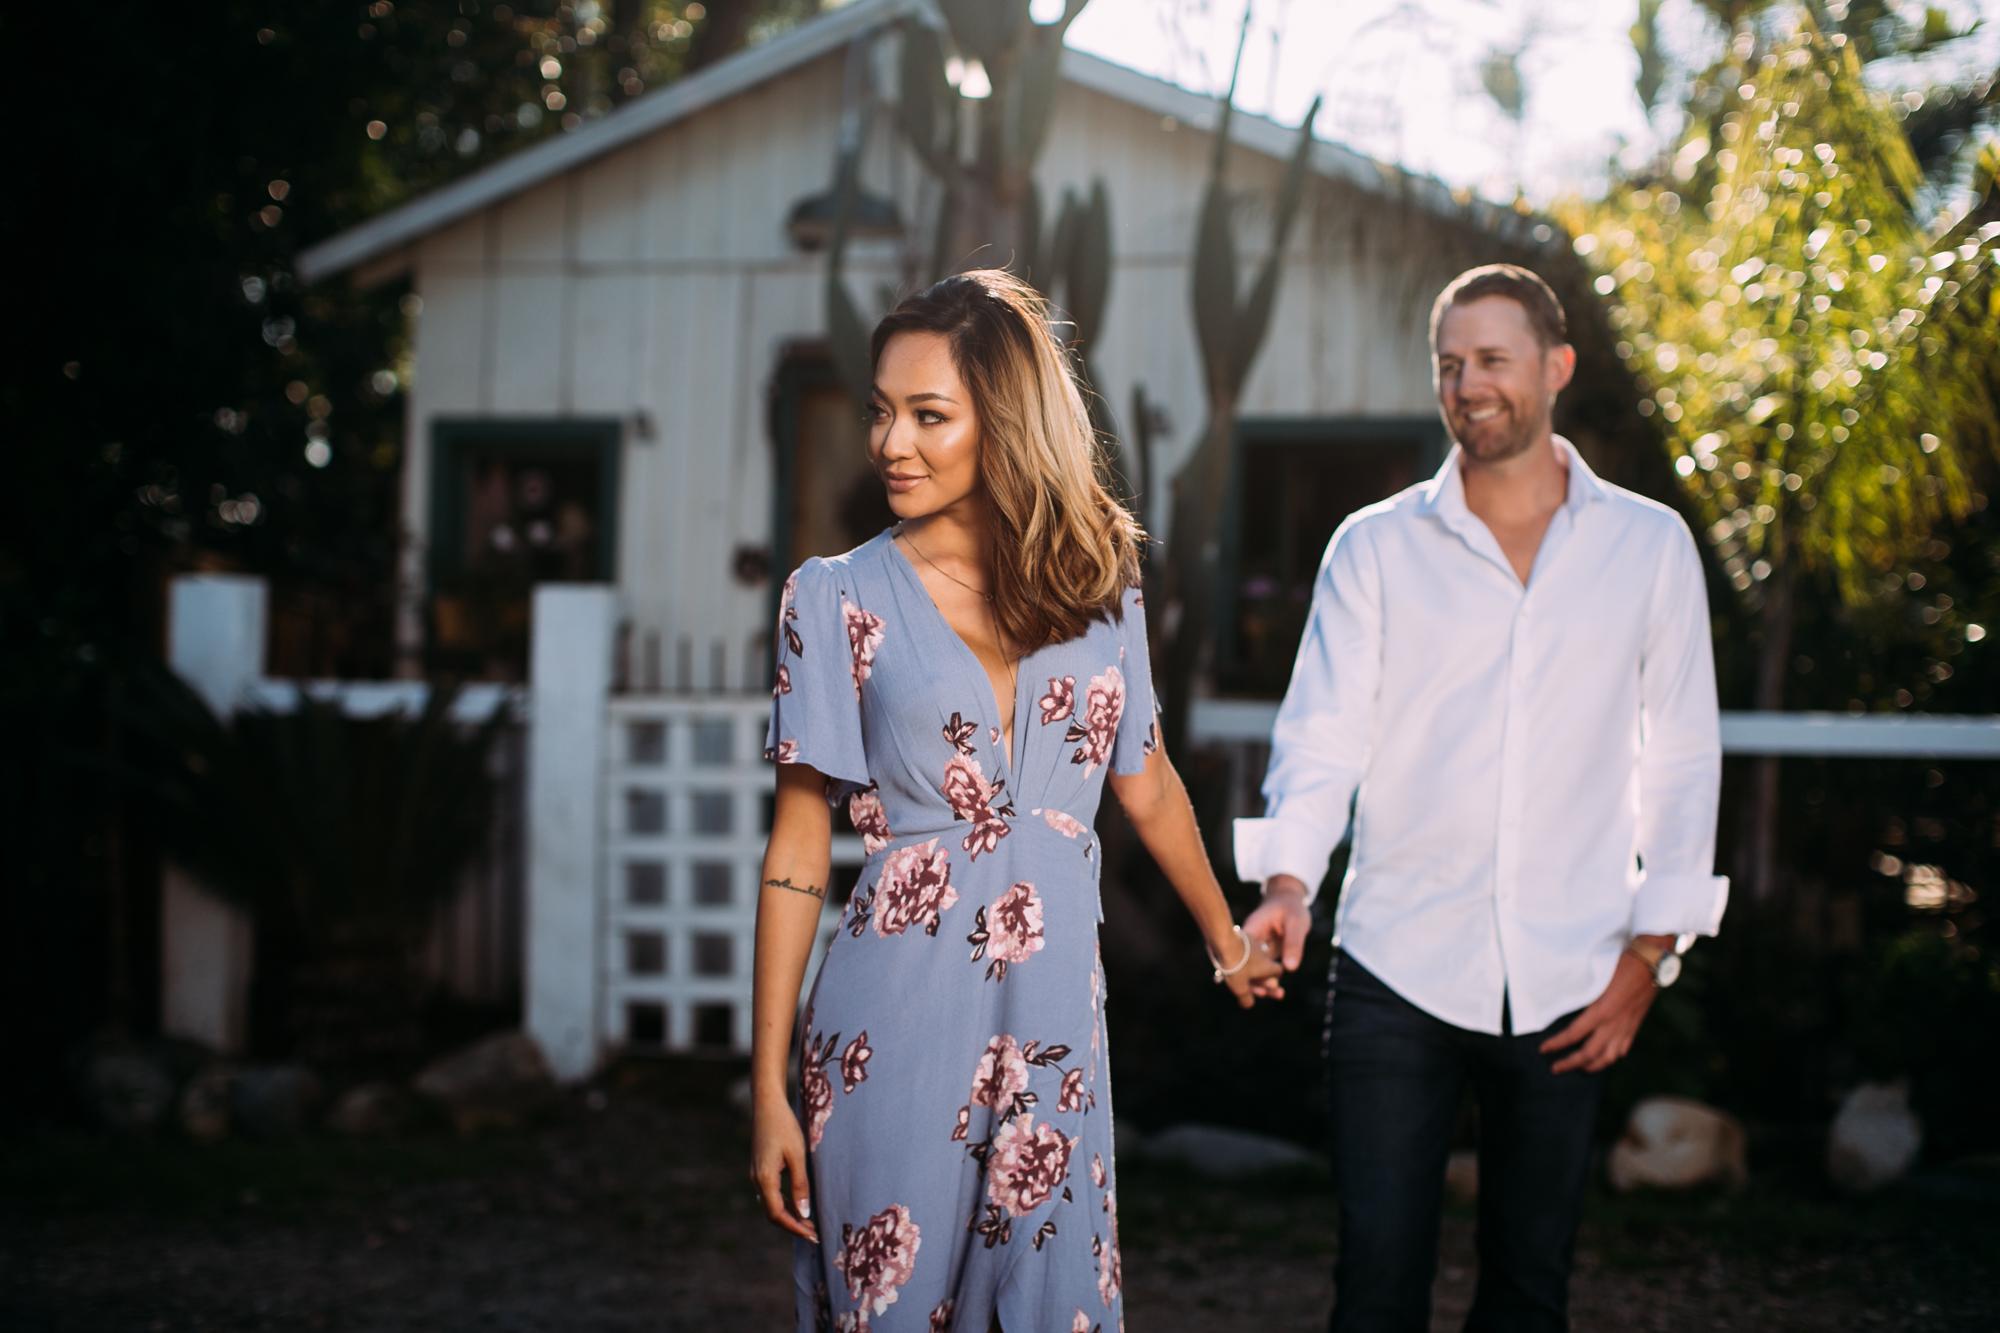 2017.3.11_Caspers-Park_Orange-County-Engagement-Sarah-Mack-Photo  89.jpg